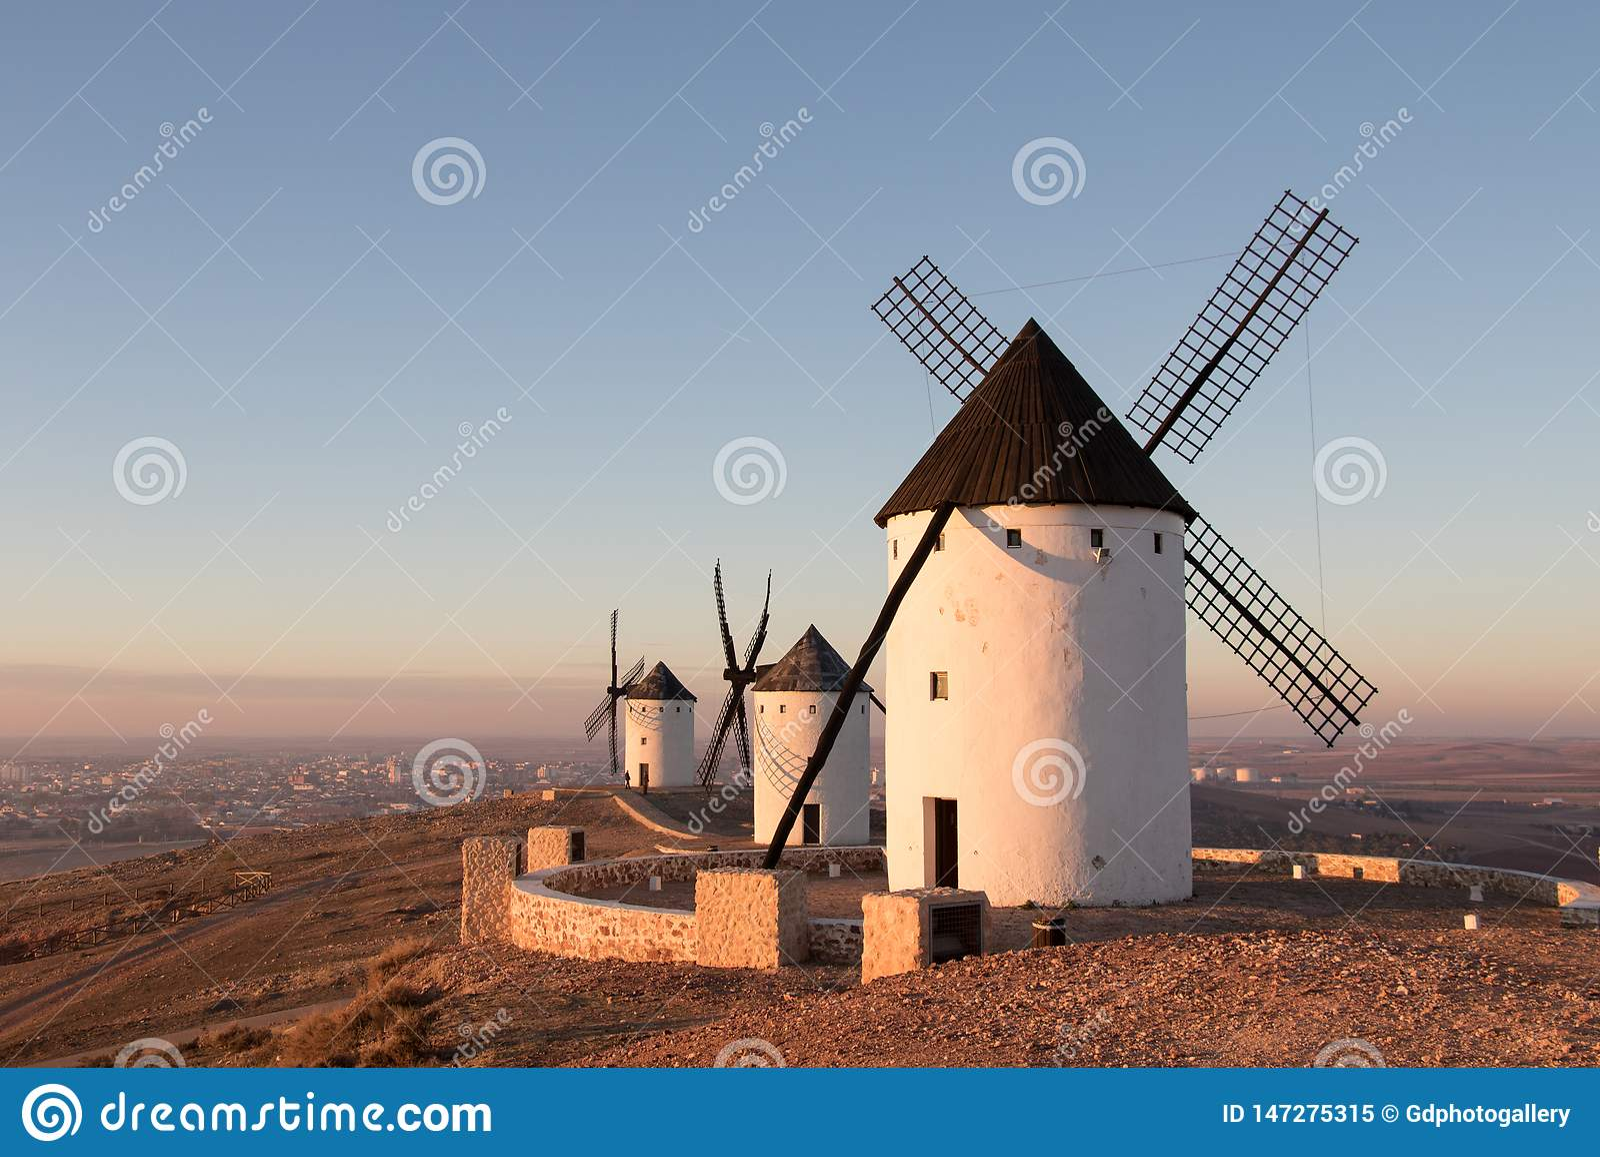 Three old windmills in Alcazar de San Juan, Casilla la Mancha. Don Quixote route. Spain